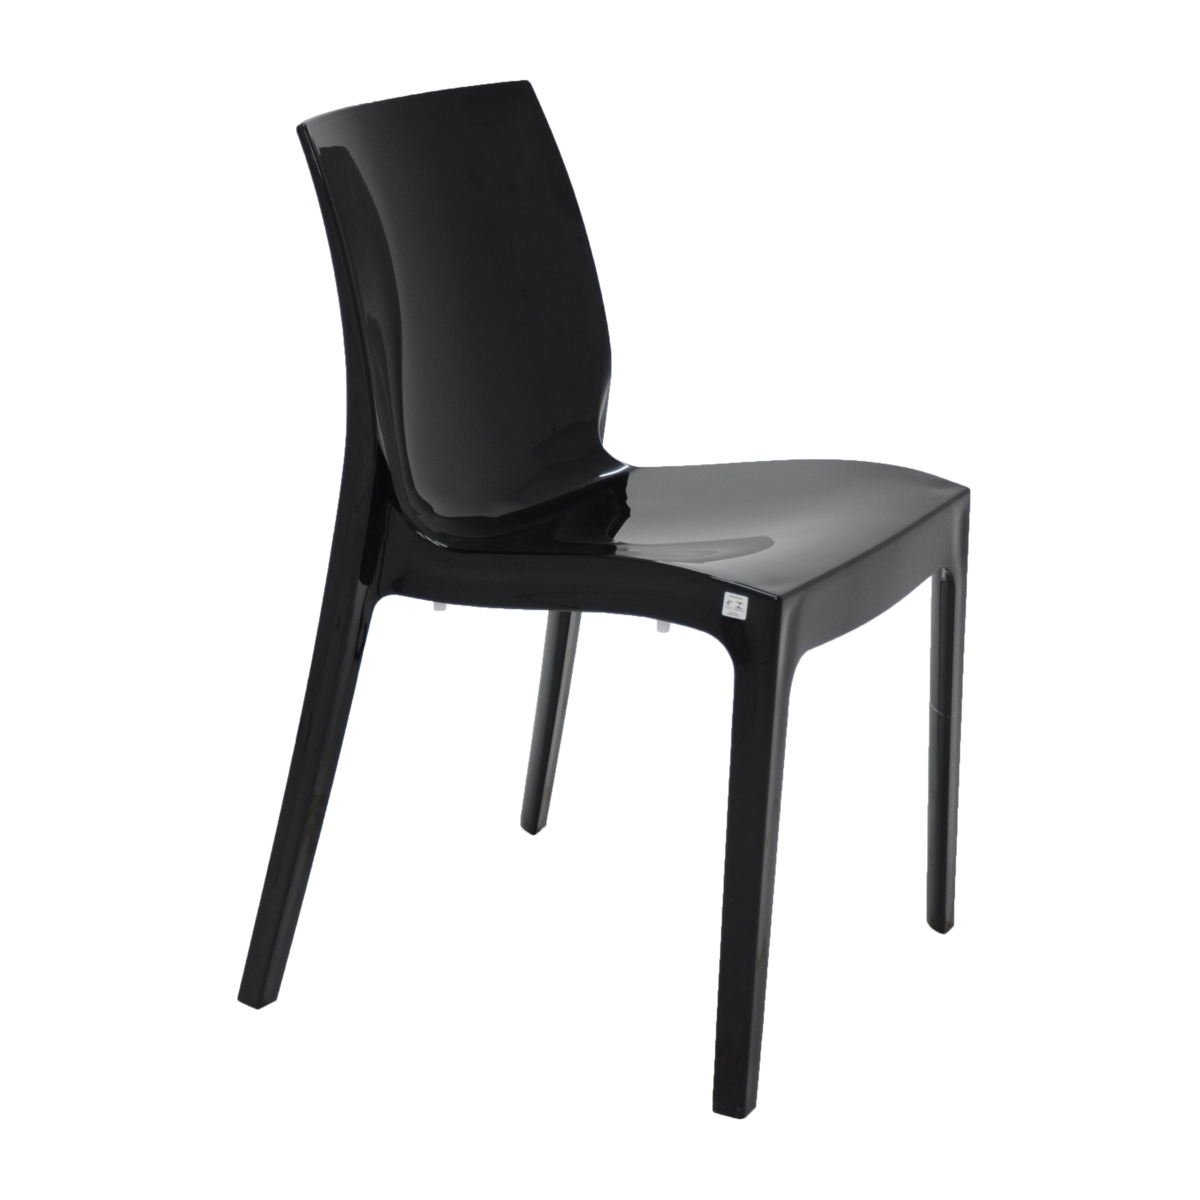 Cadeira de Polipropileno Alice Preta - Tramontina